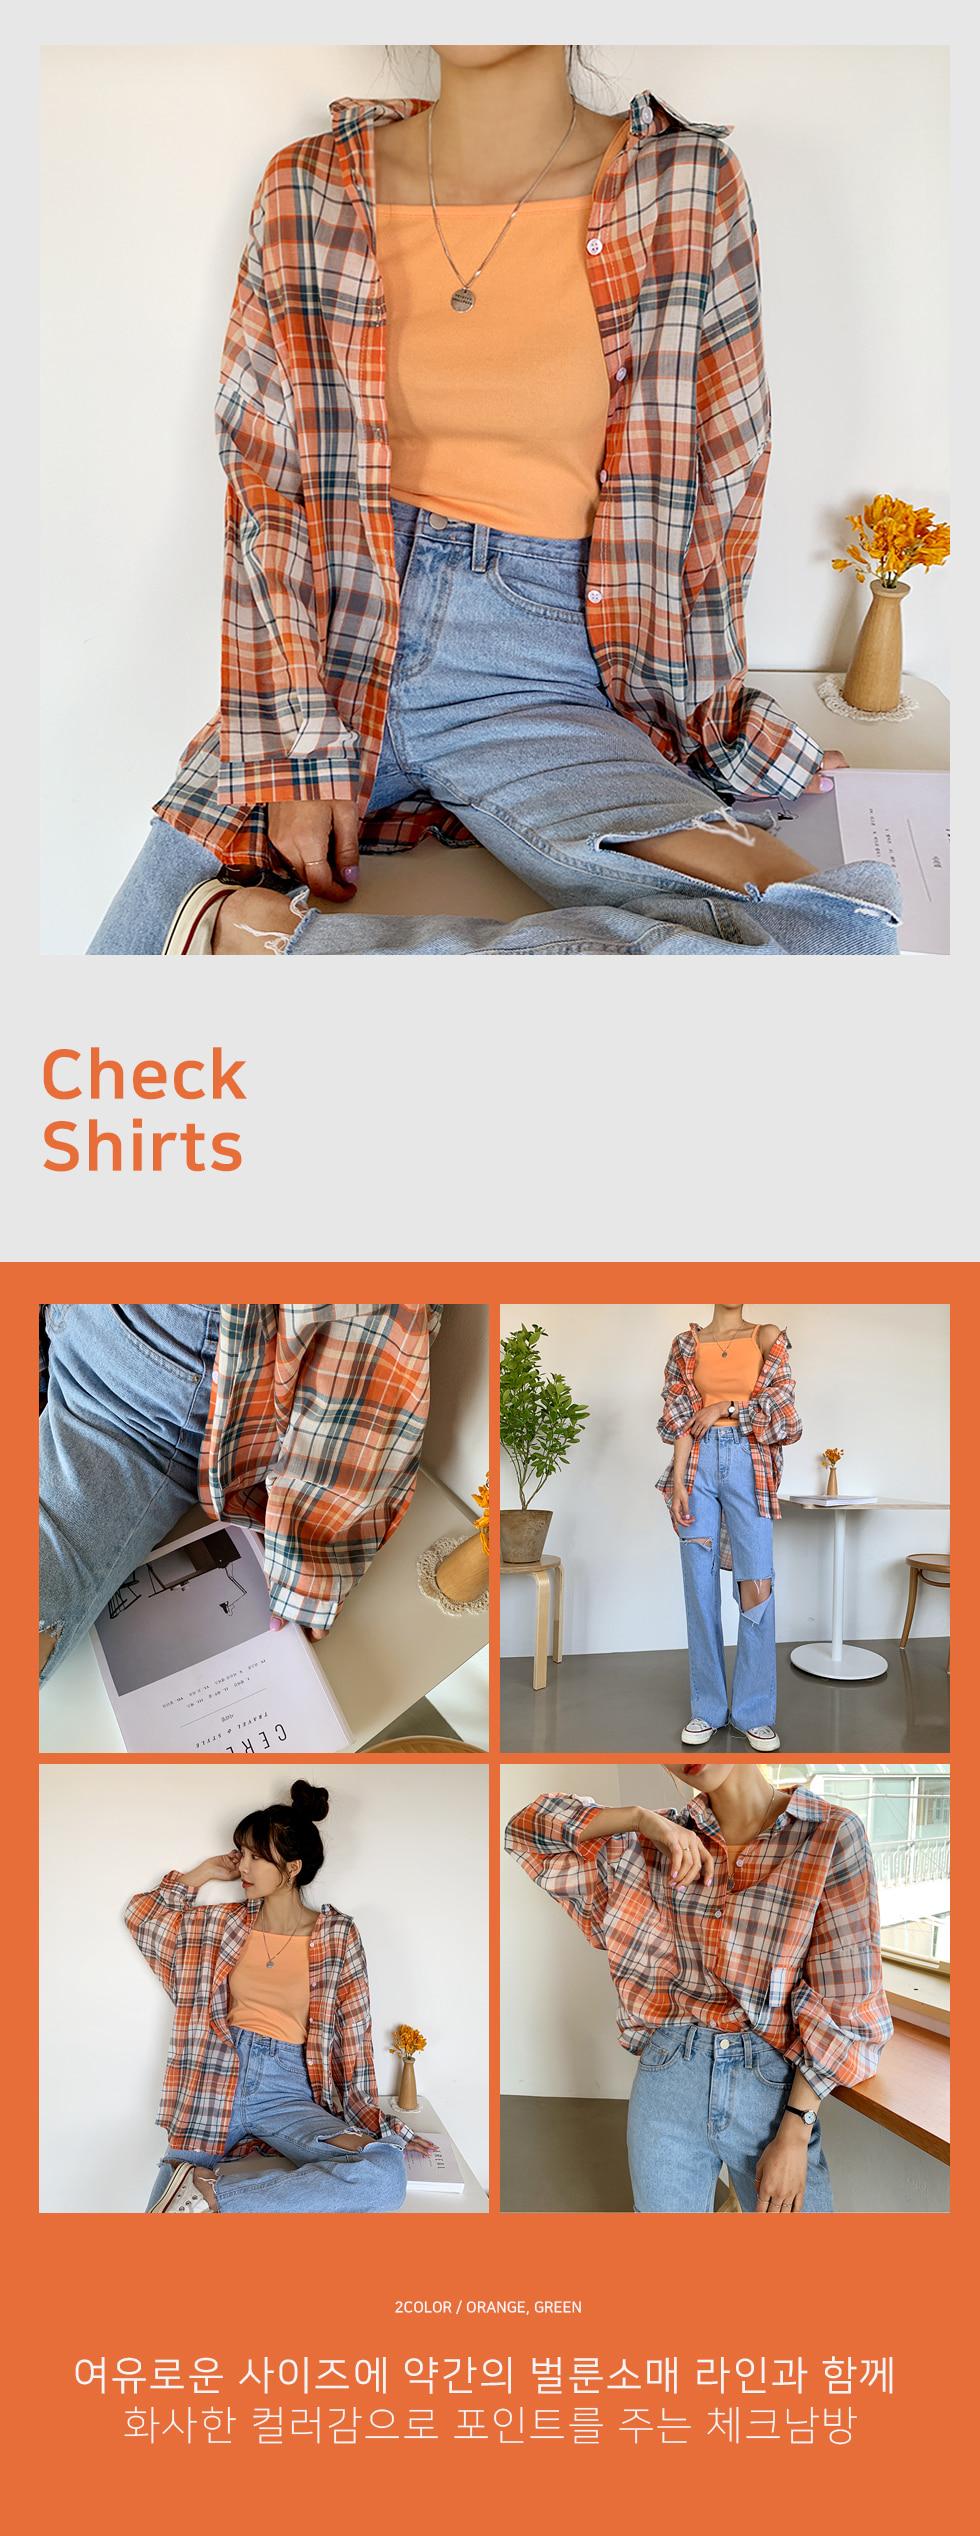 Check Restaurant Shirt